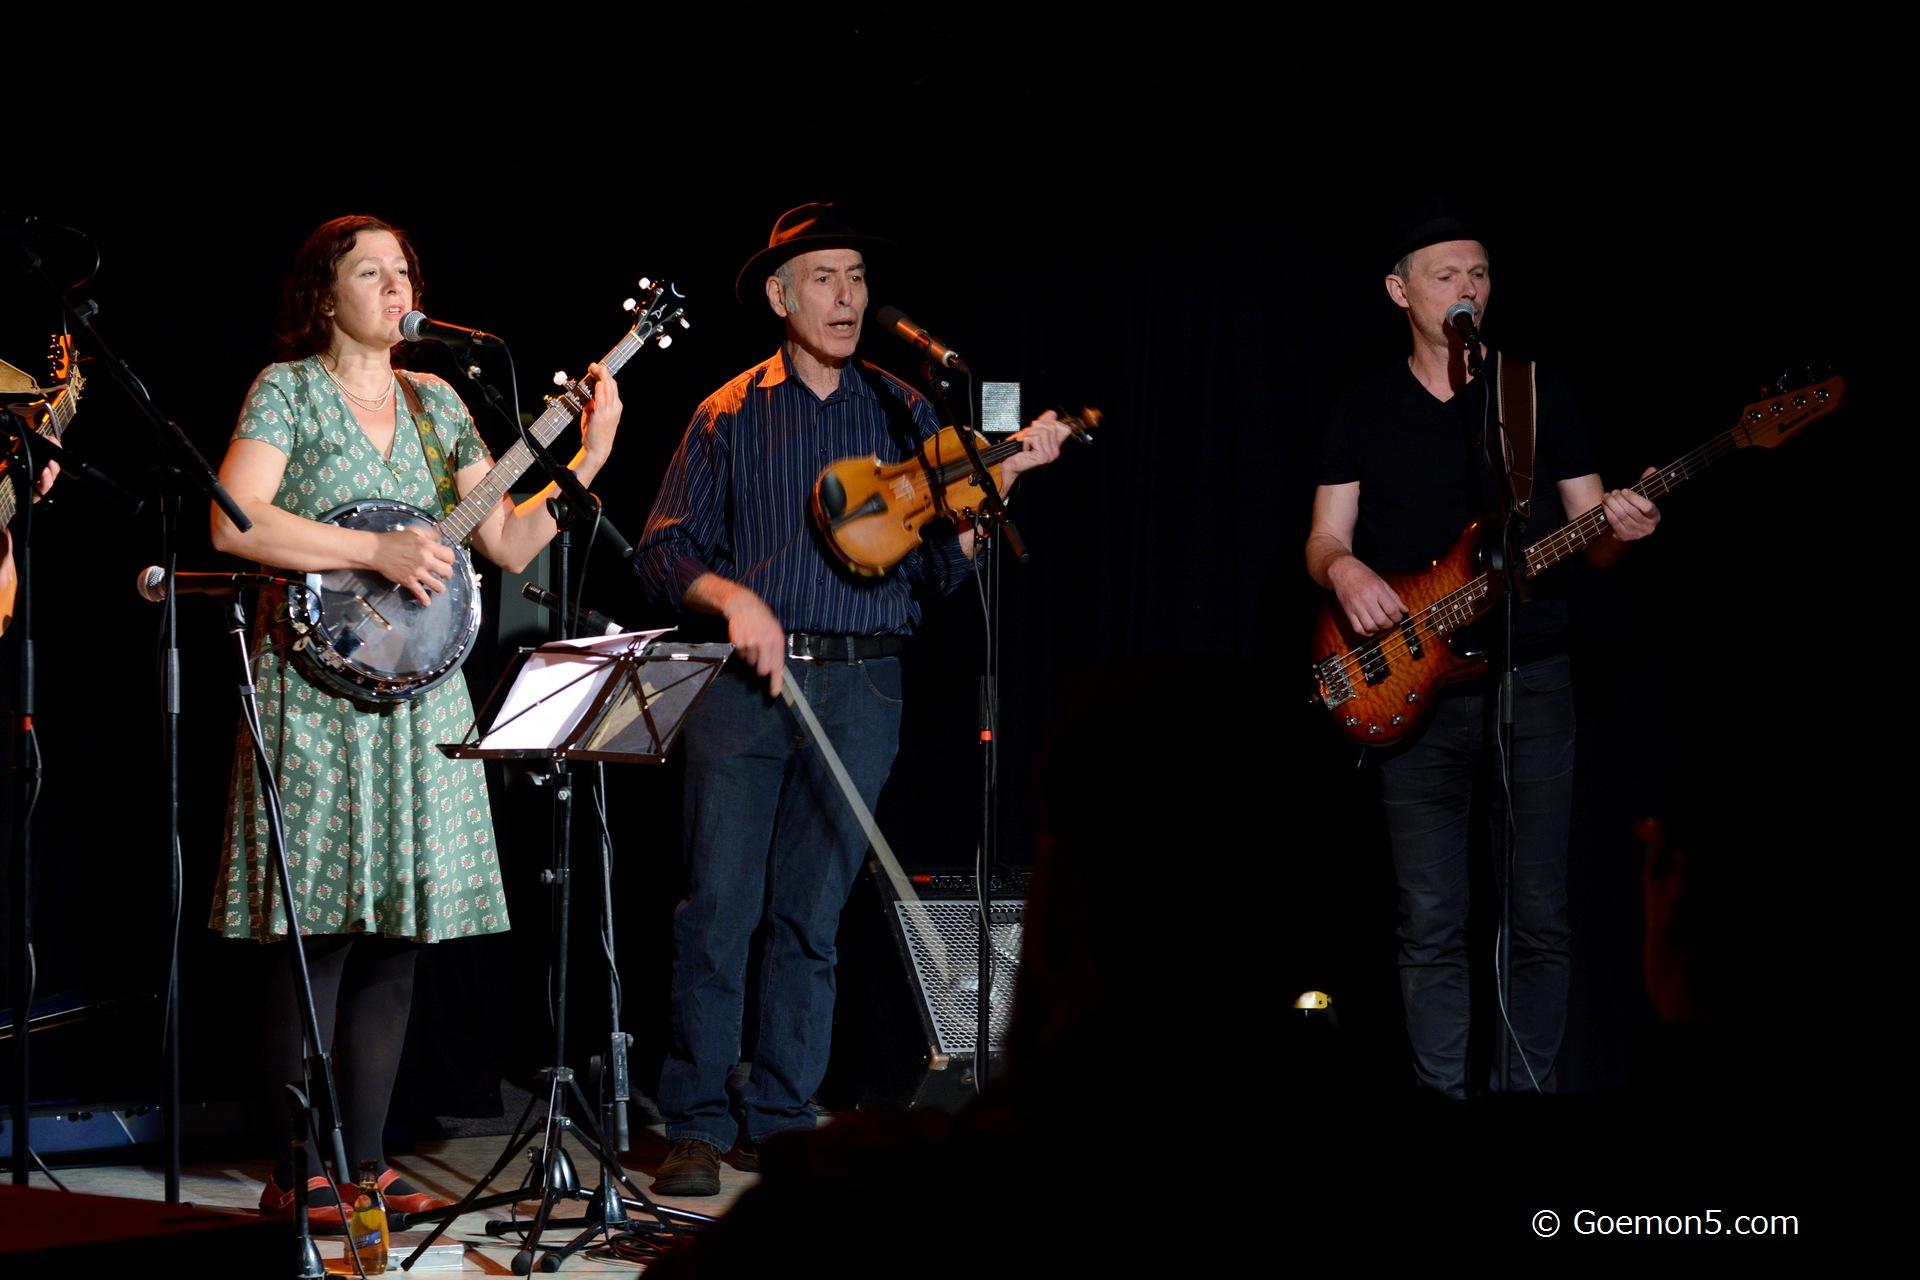 FolknWalde at Parkclub 2018 - Inka & The Neighbors 06